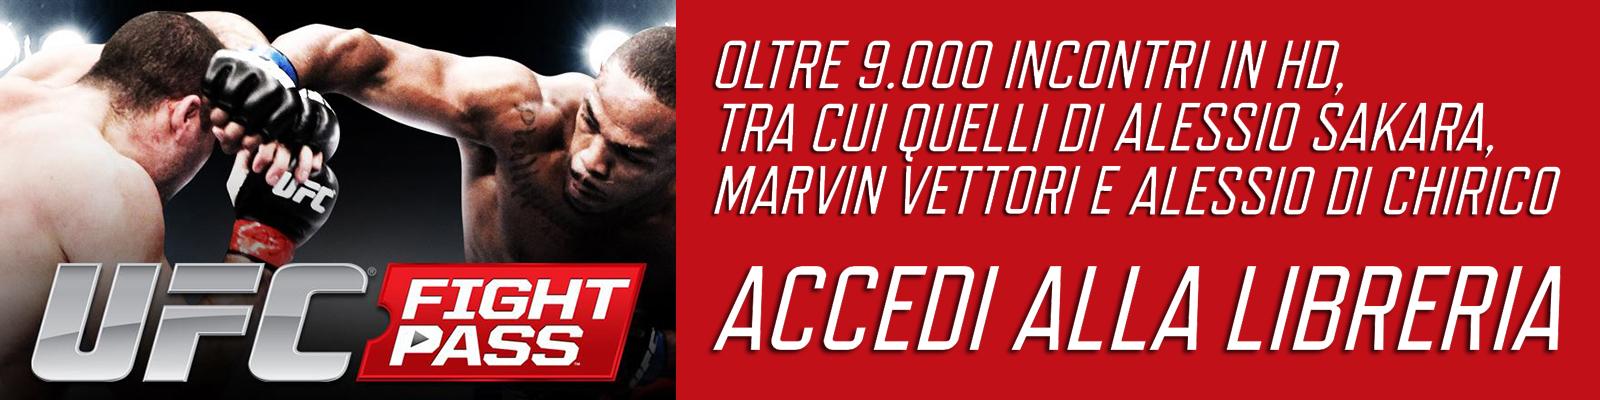 UFC Fight Pass